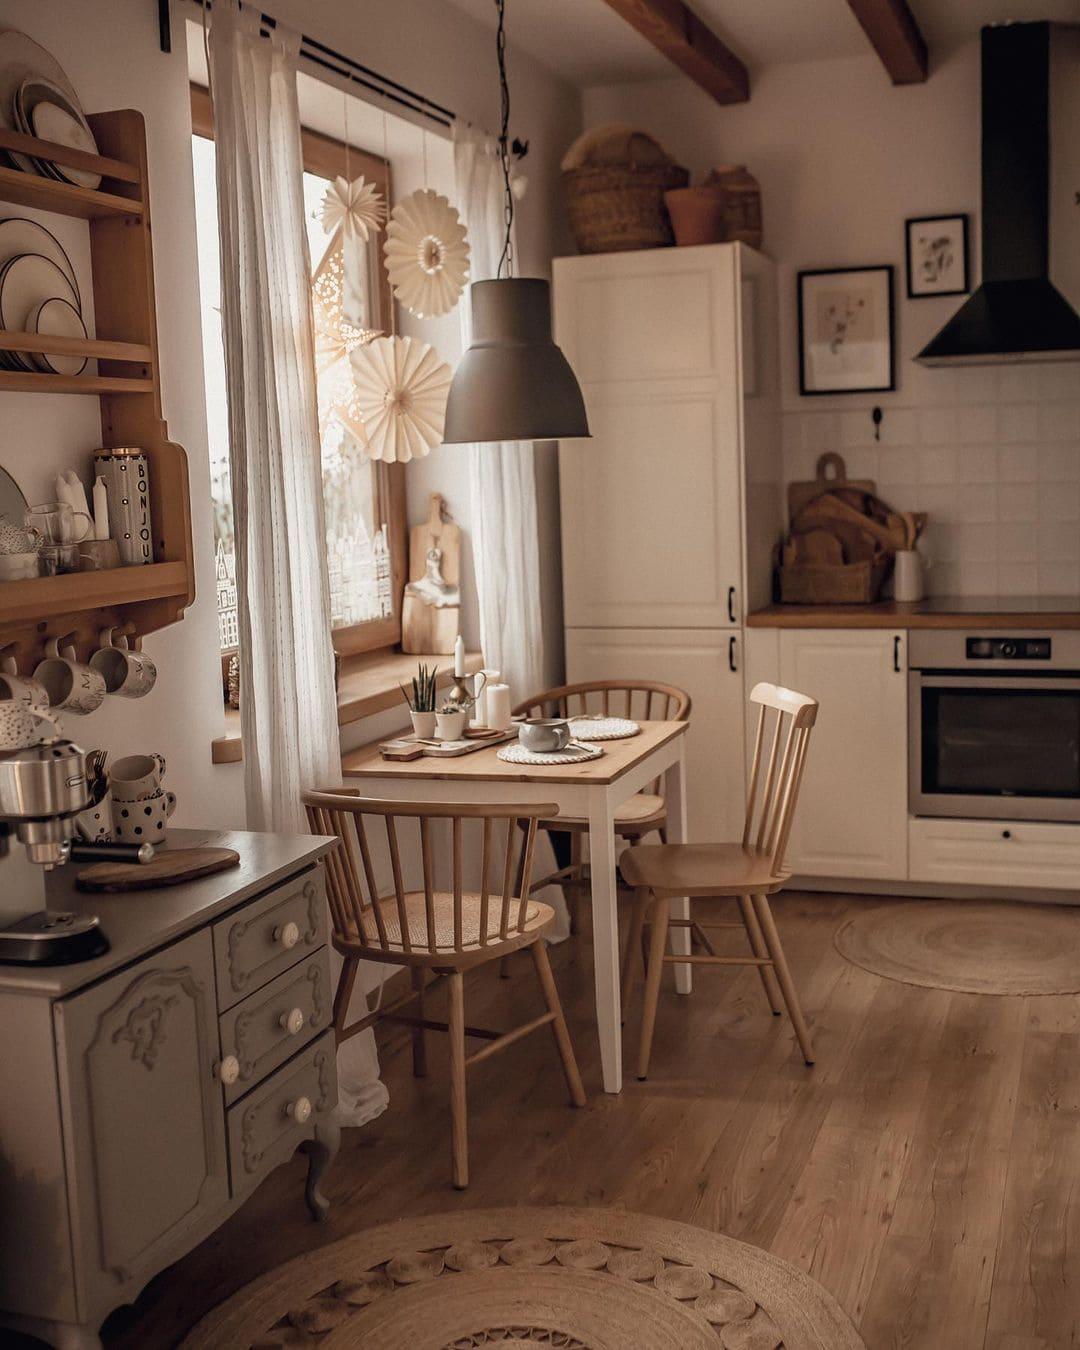 How to amazing kitchen design